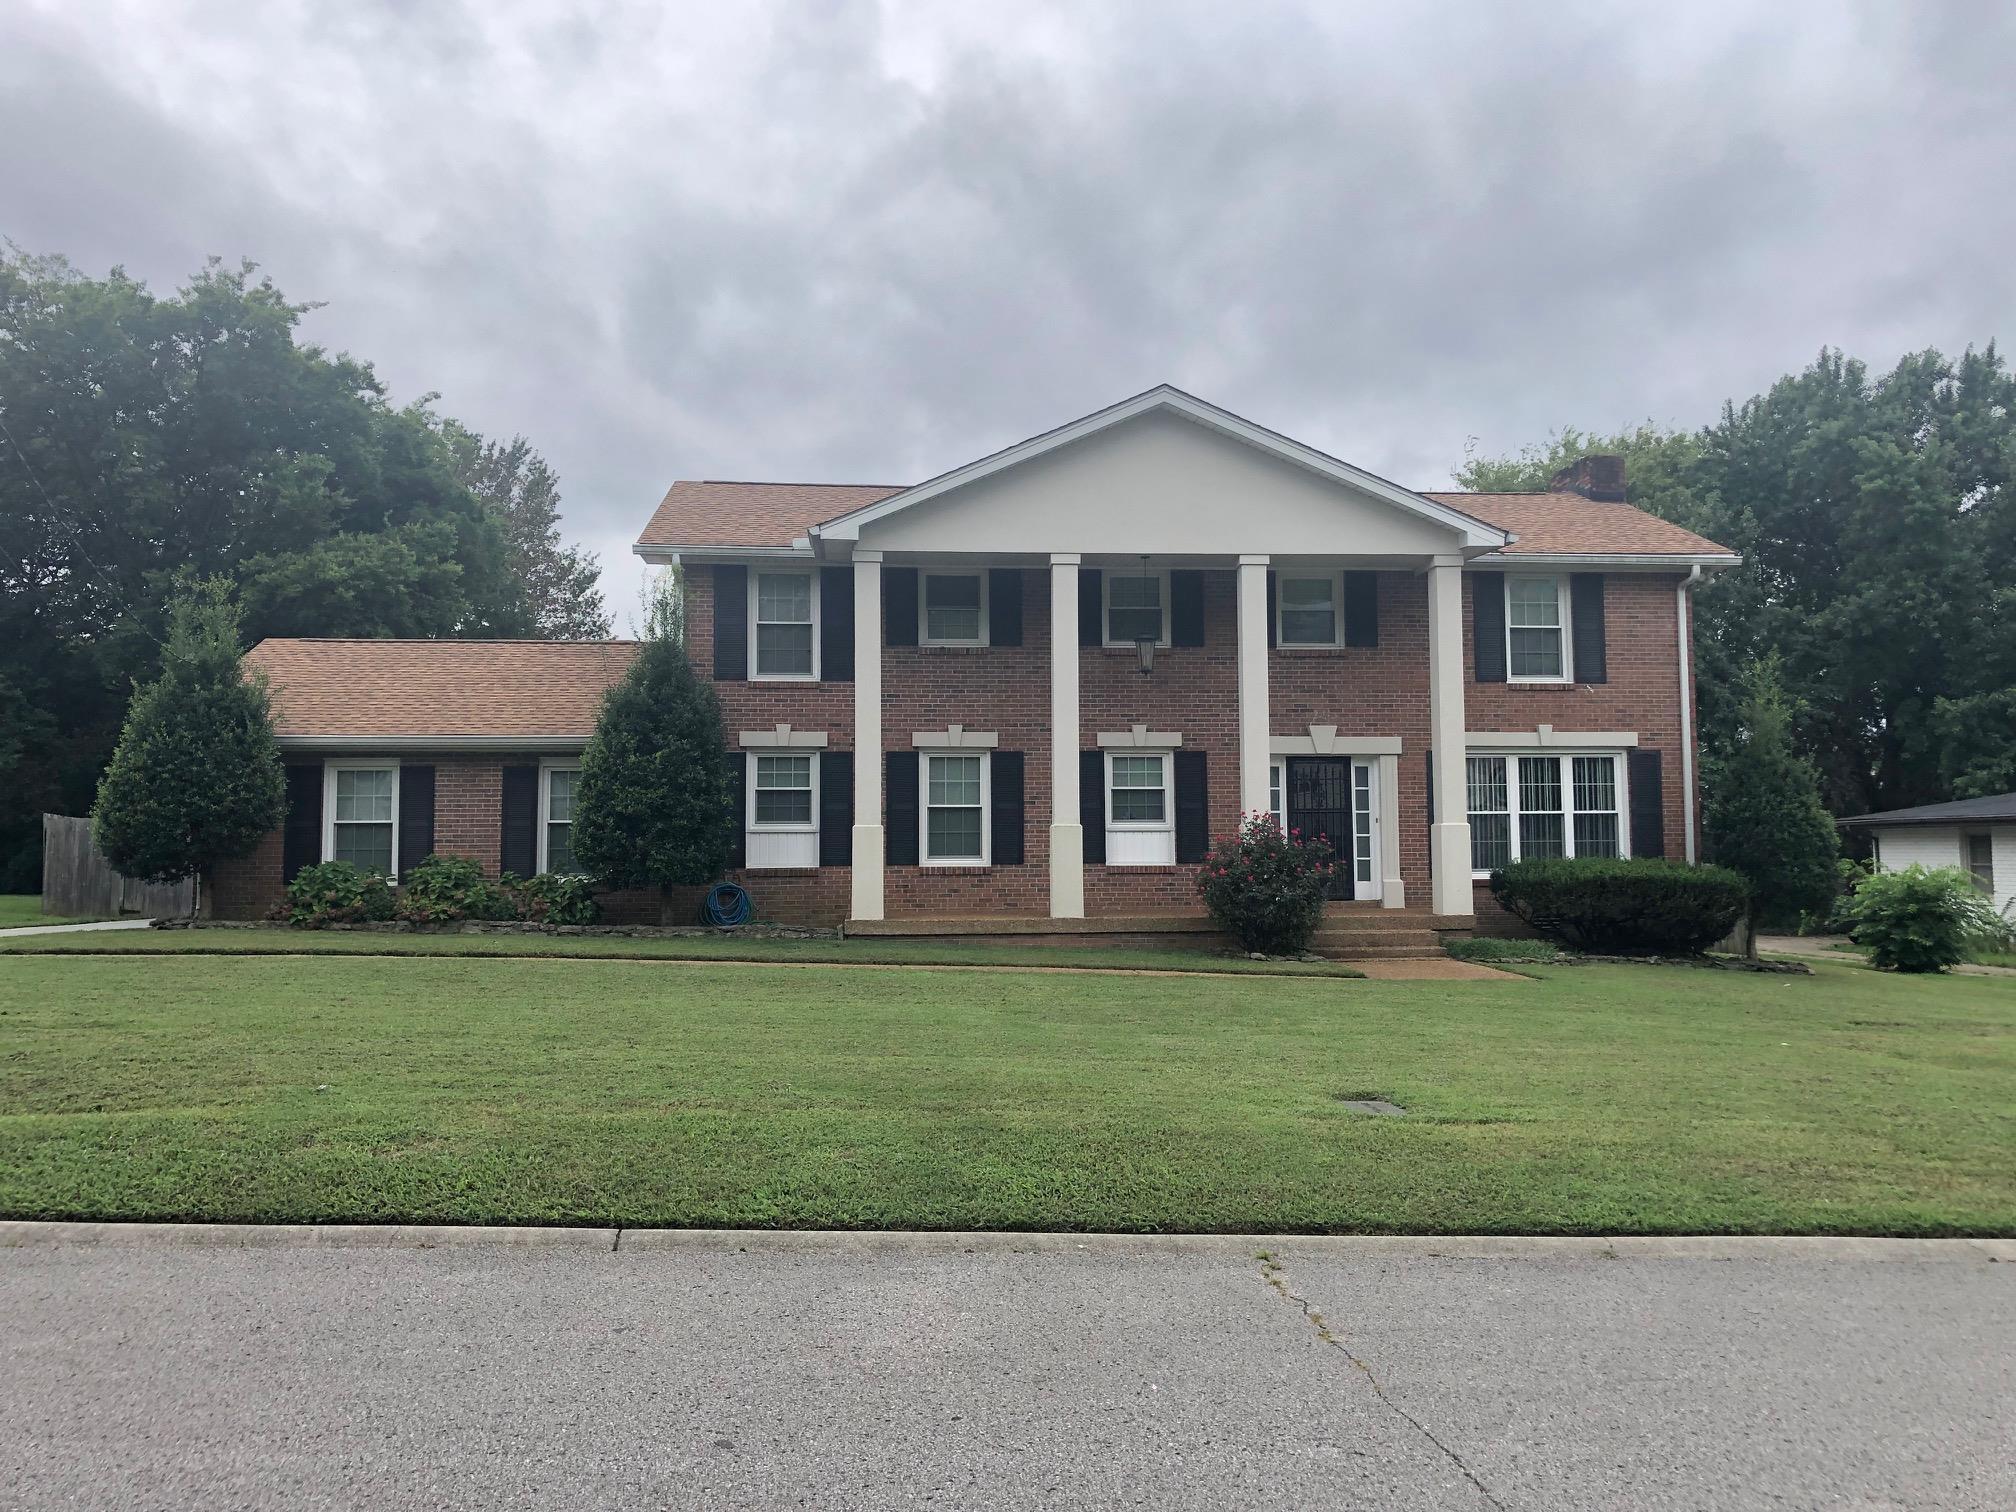 137 Saxon Mist Dr, Nashville, TN 37217 - Nashville, TN real estate listing